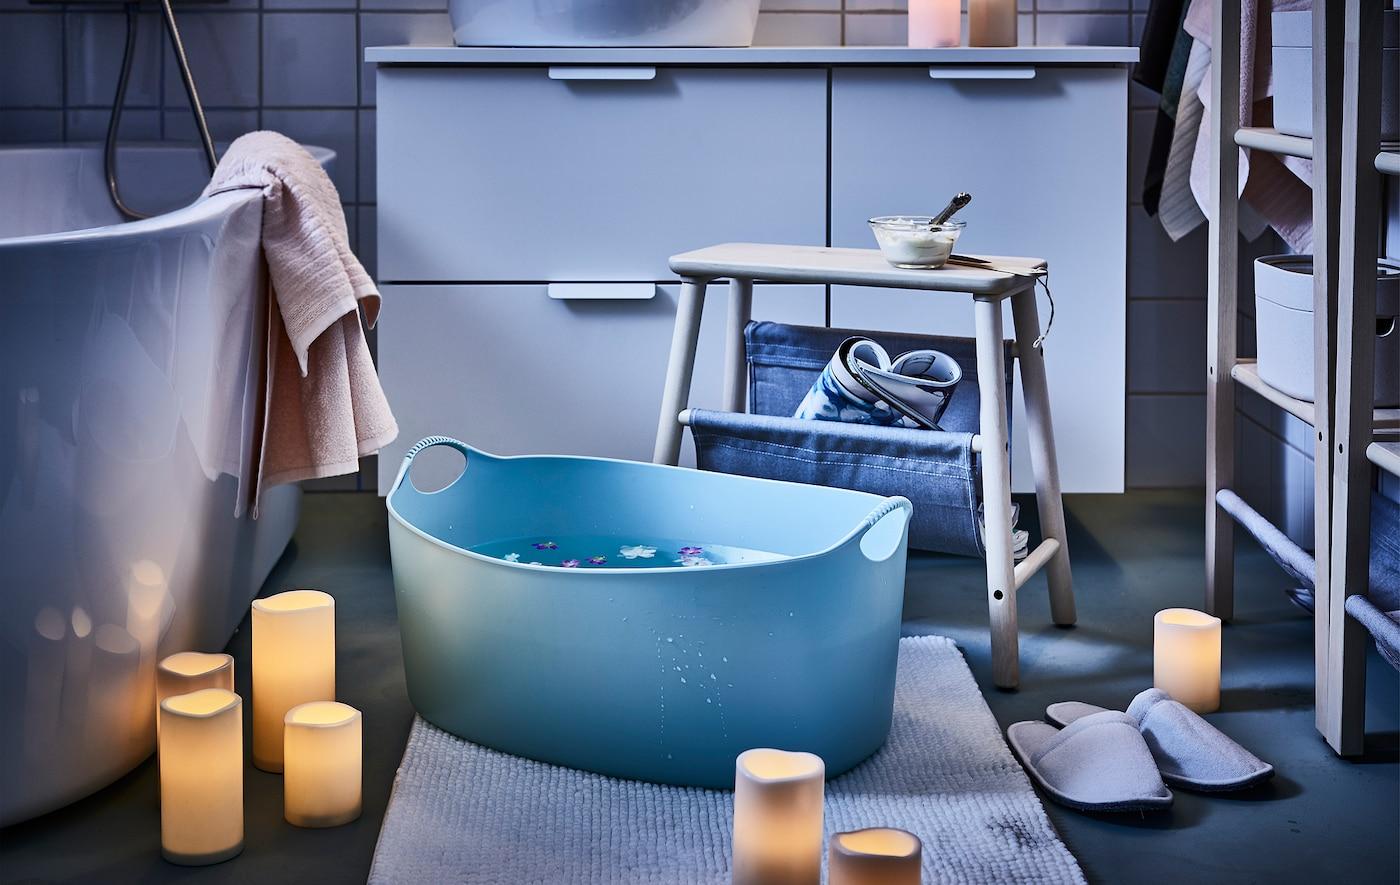 Prava atmosfera u kupatilu uz raštrkane LED blok sveće; stoličica pored velikog masažera stopala, cveće posuto po njemu.